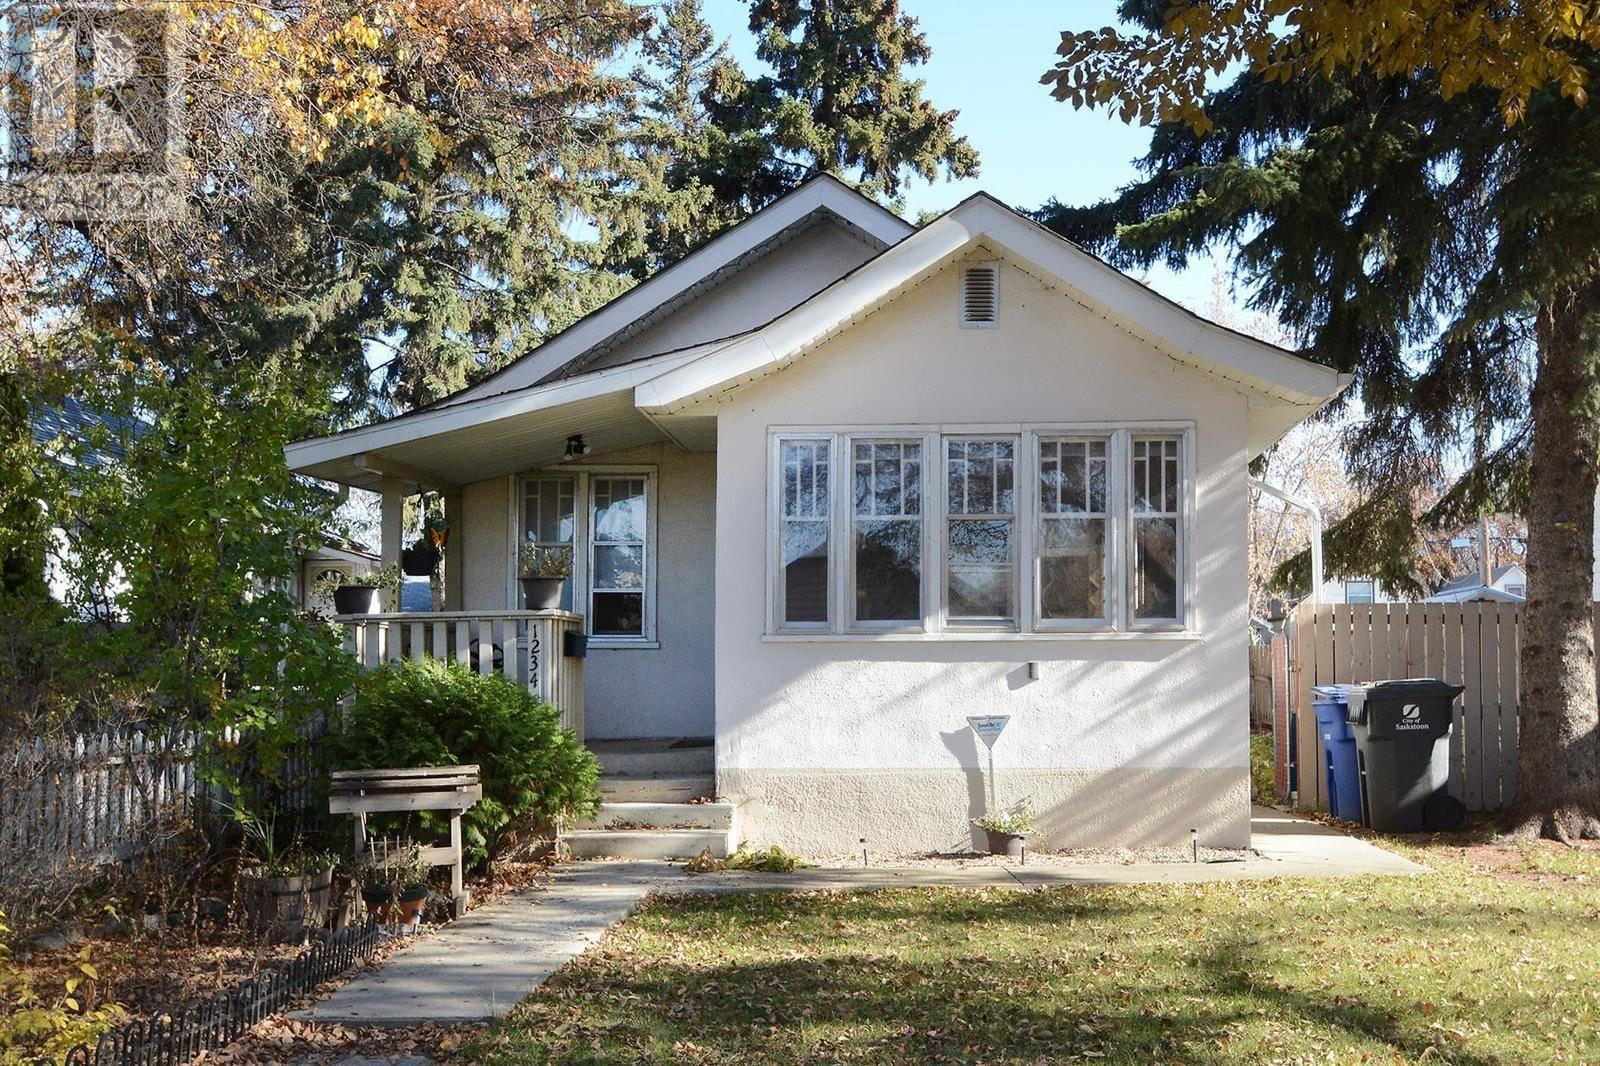 House for sale at 1234 G Ave N Saskatoon Saskatchewan - MLS: SK789618